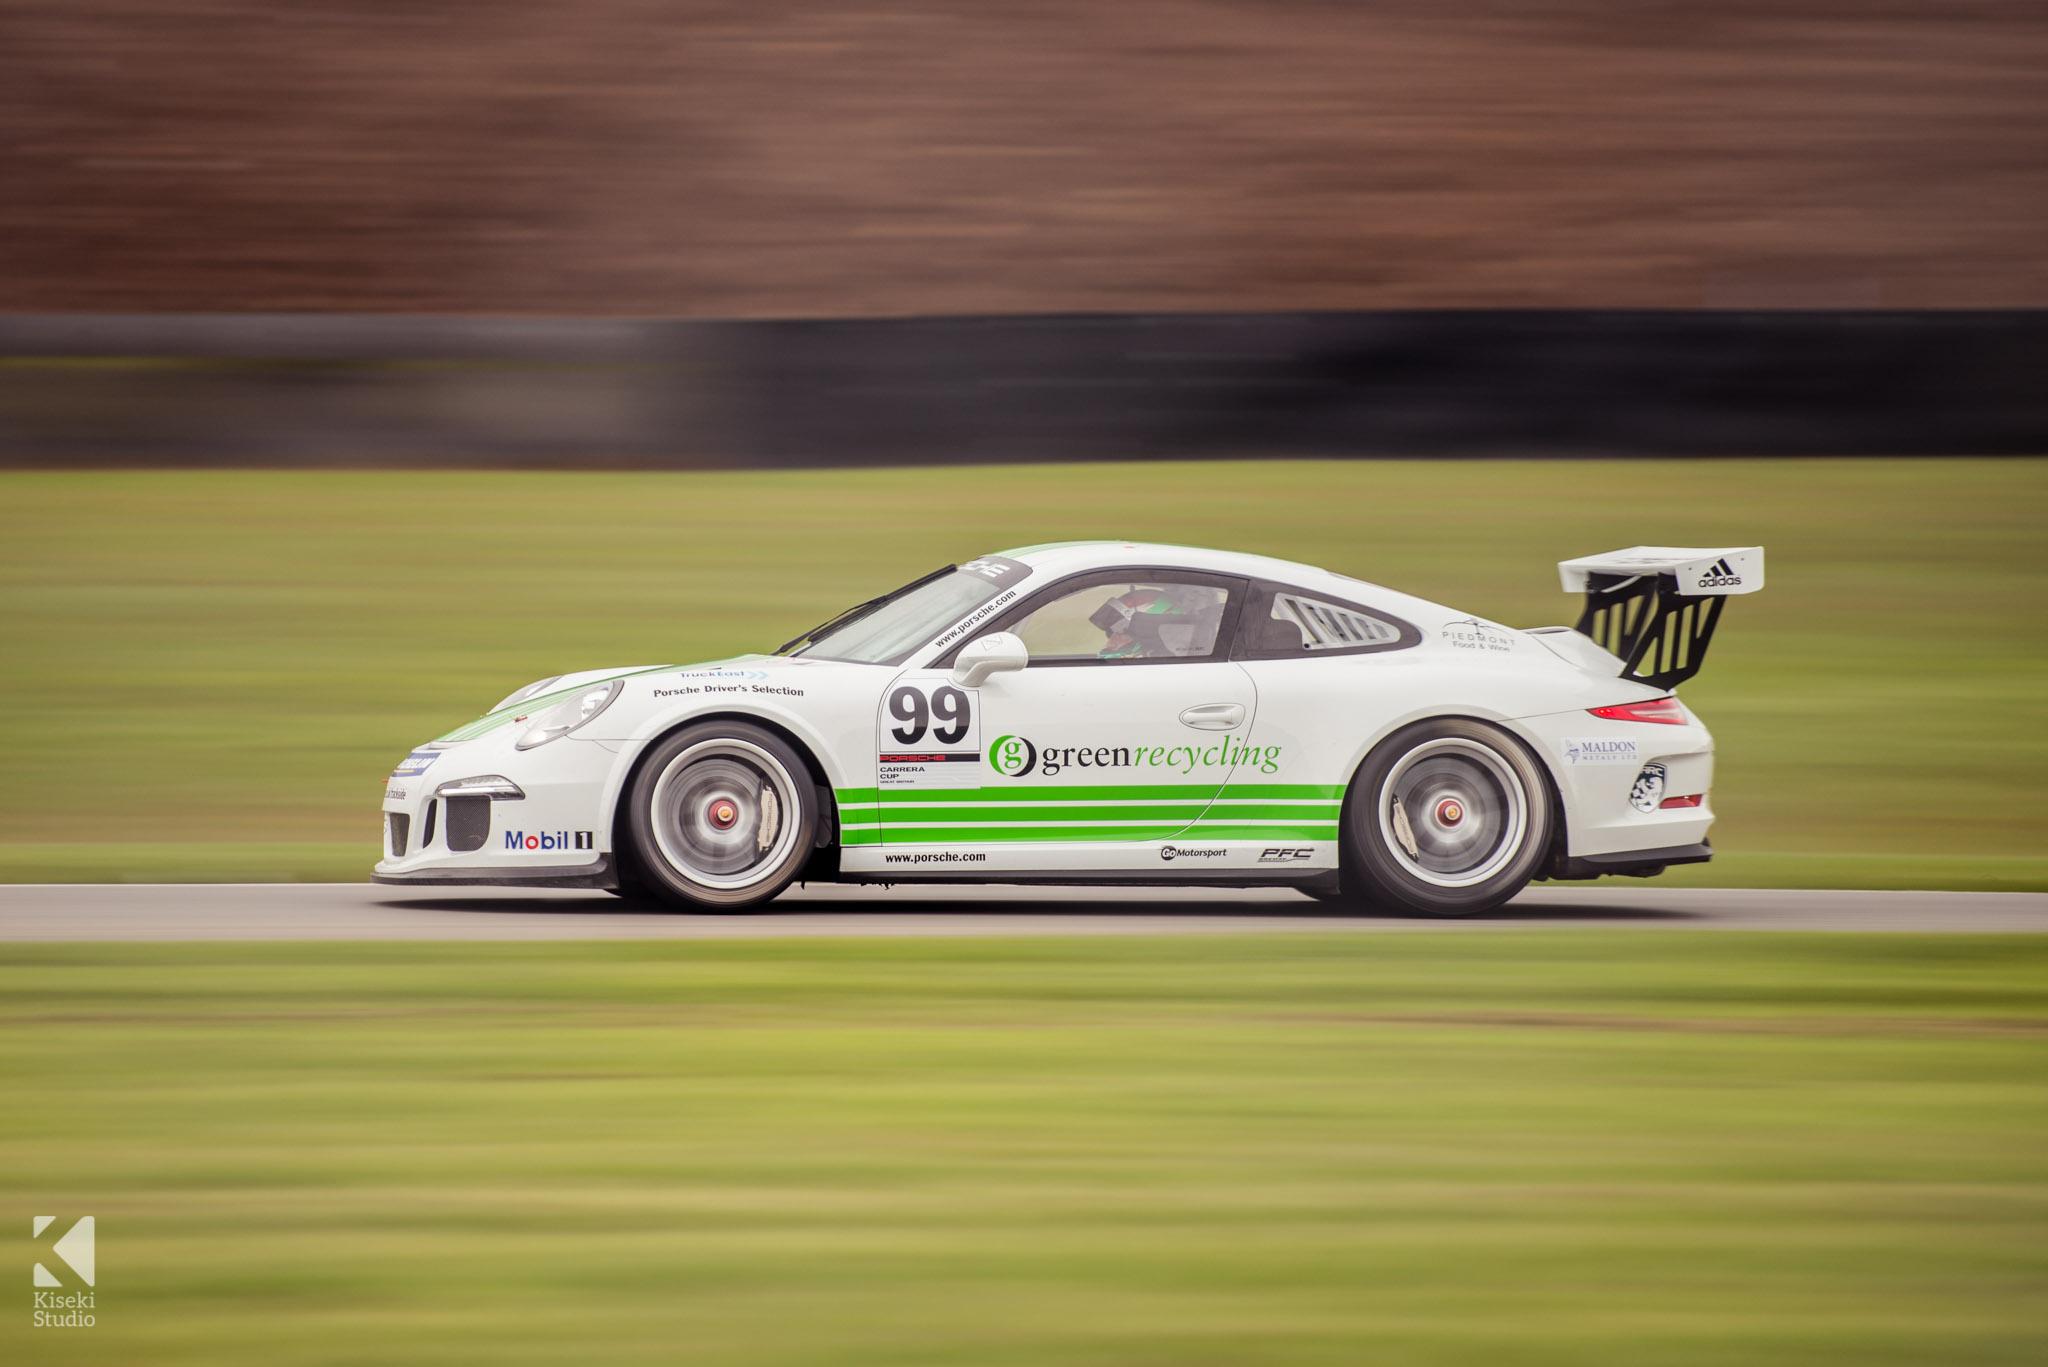 Porsche 911 GT3 Cup 991 at Donington